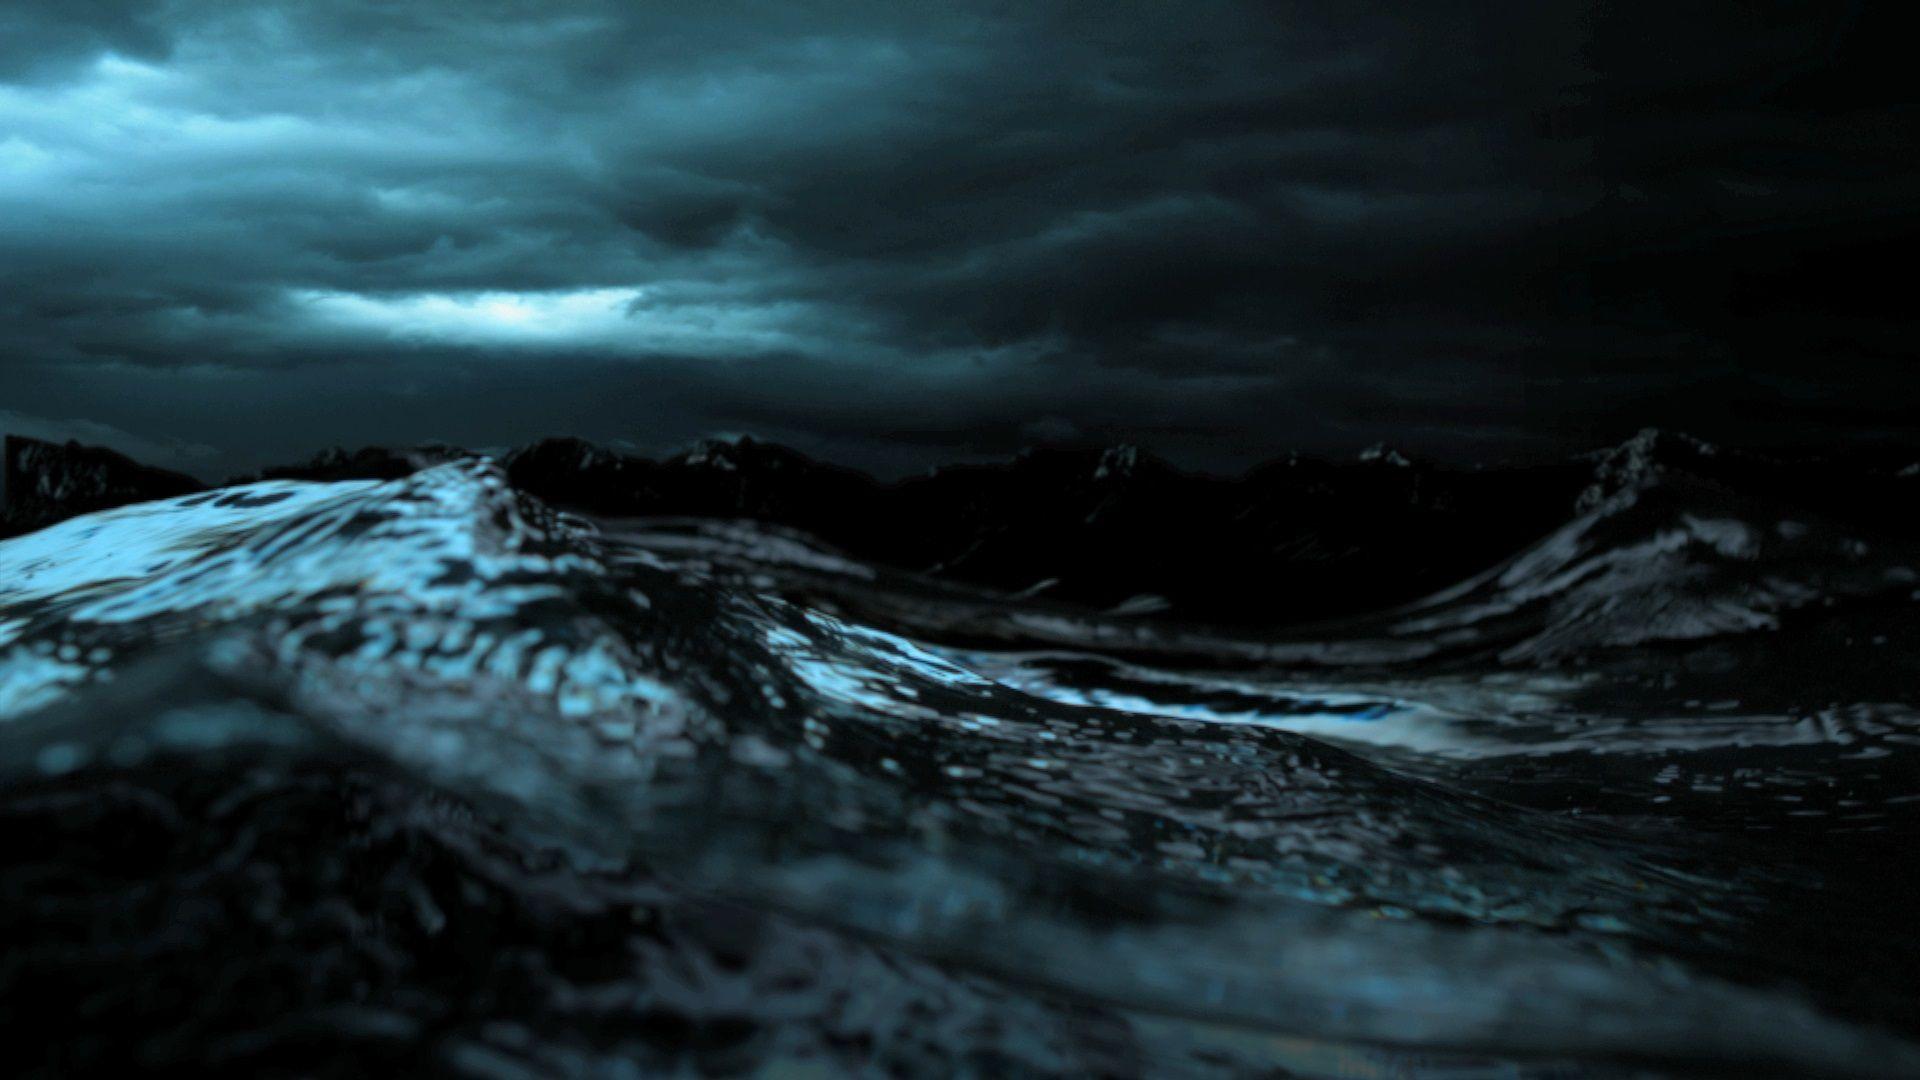 Billennium Waves by Tang Nannan